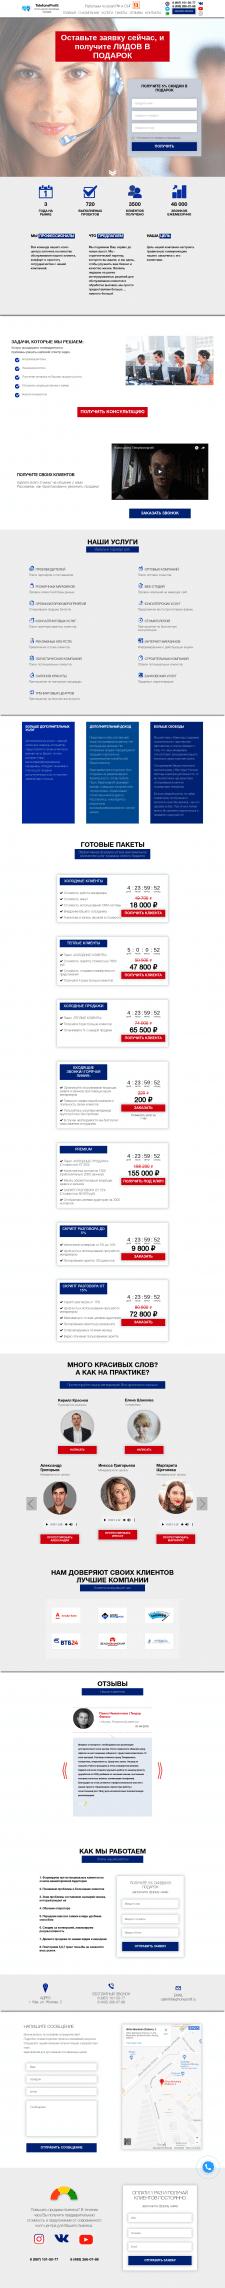 TelefoneProfit - Колл-центр Активных продаж